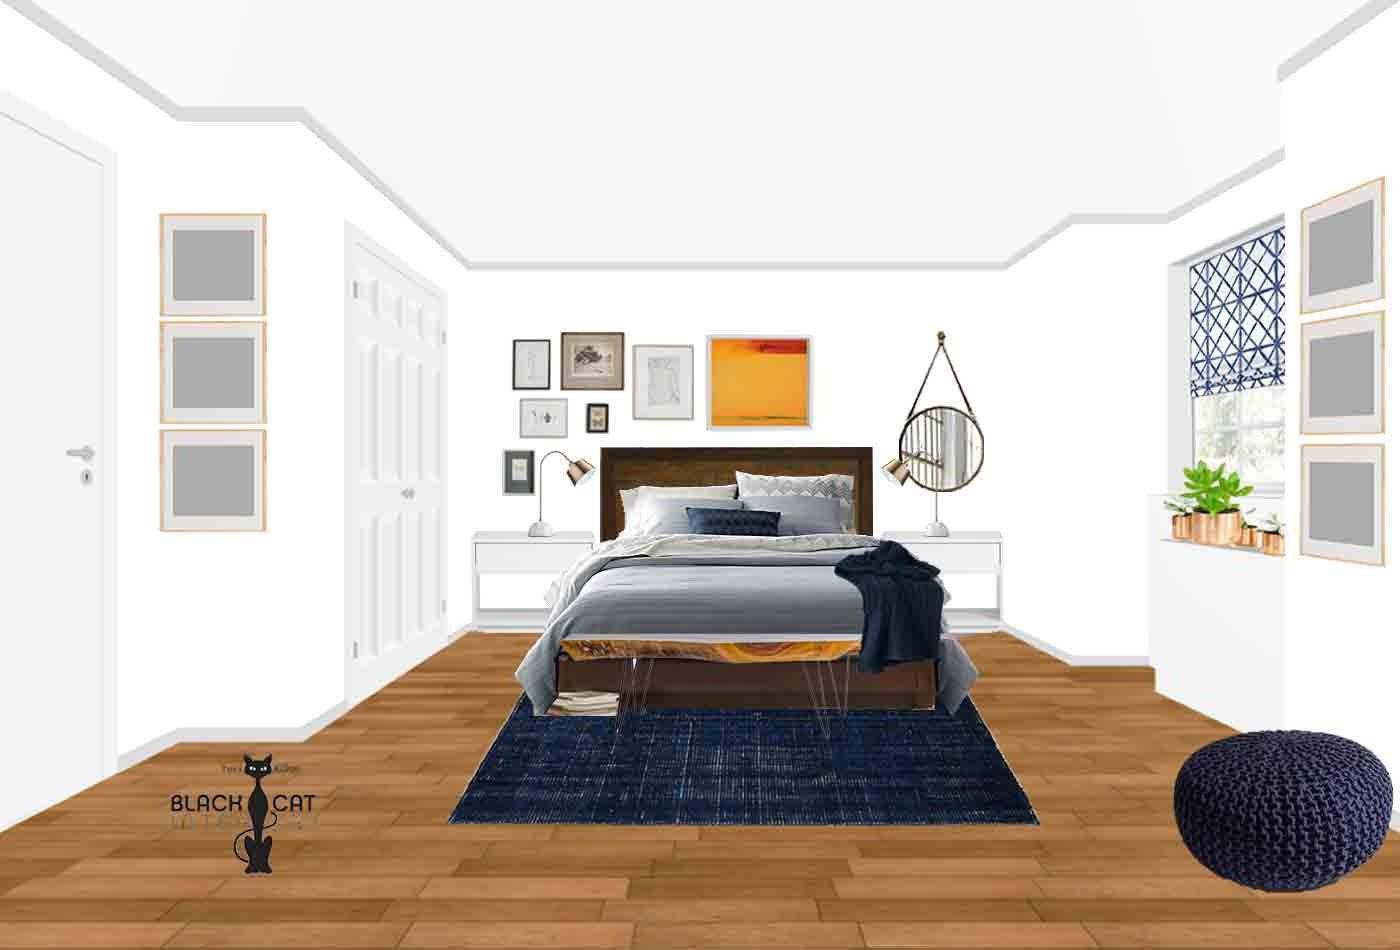 Boho Bedroom Online Interior Design Package Eclectic